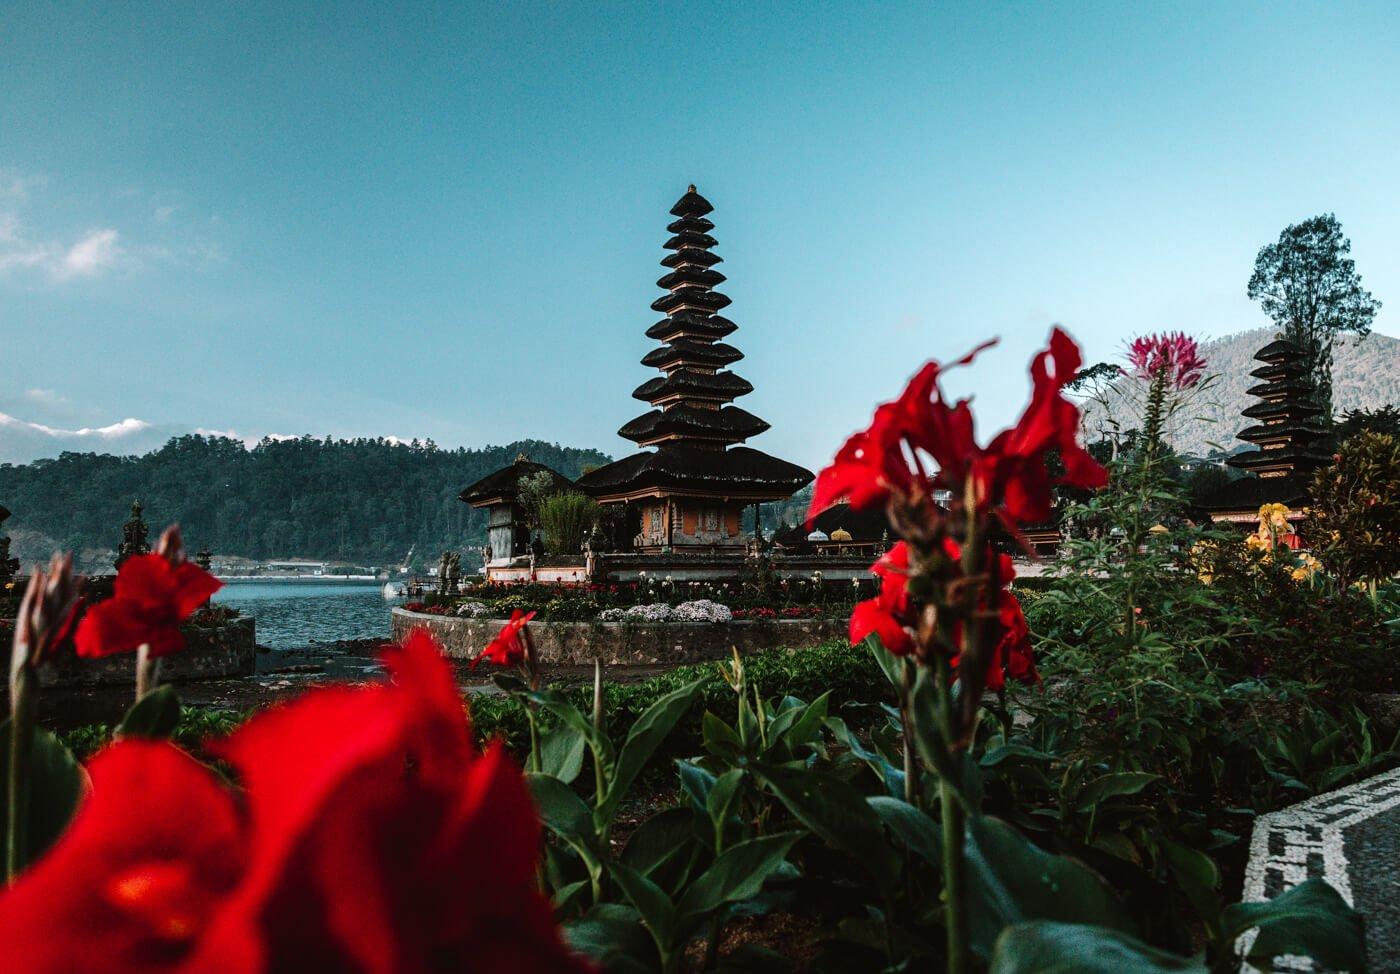 Ilha de Bali - Templo Ulun Danu Bratan